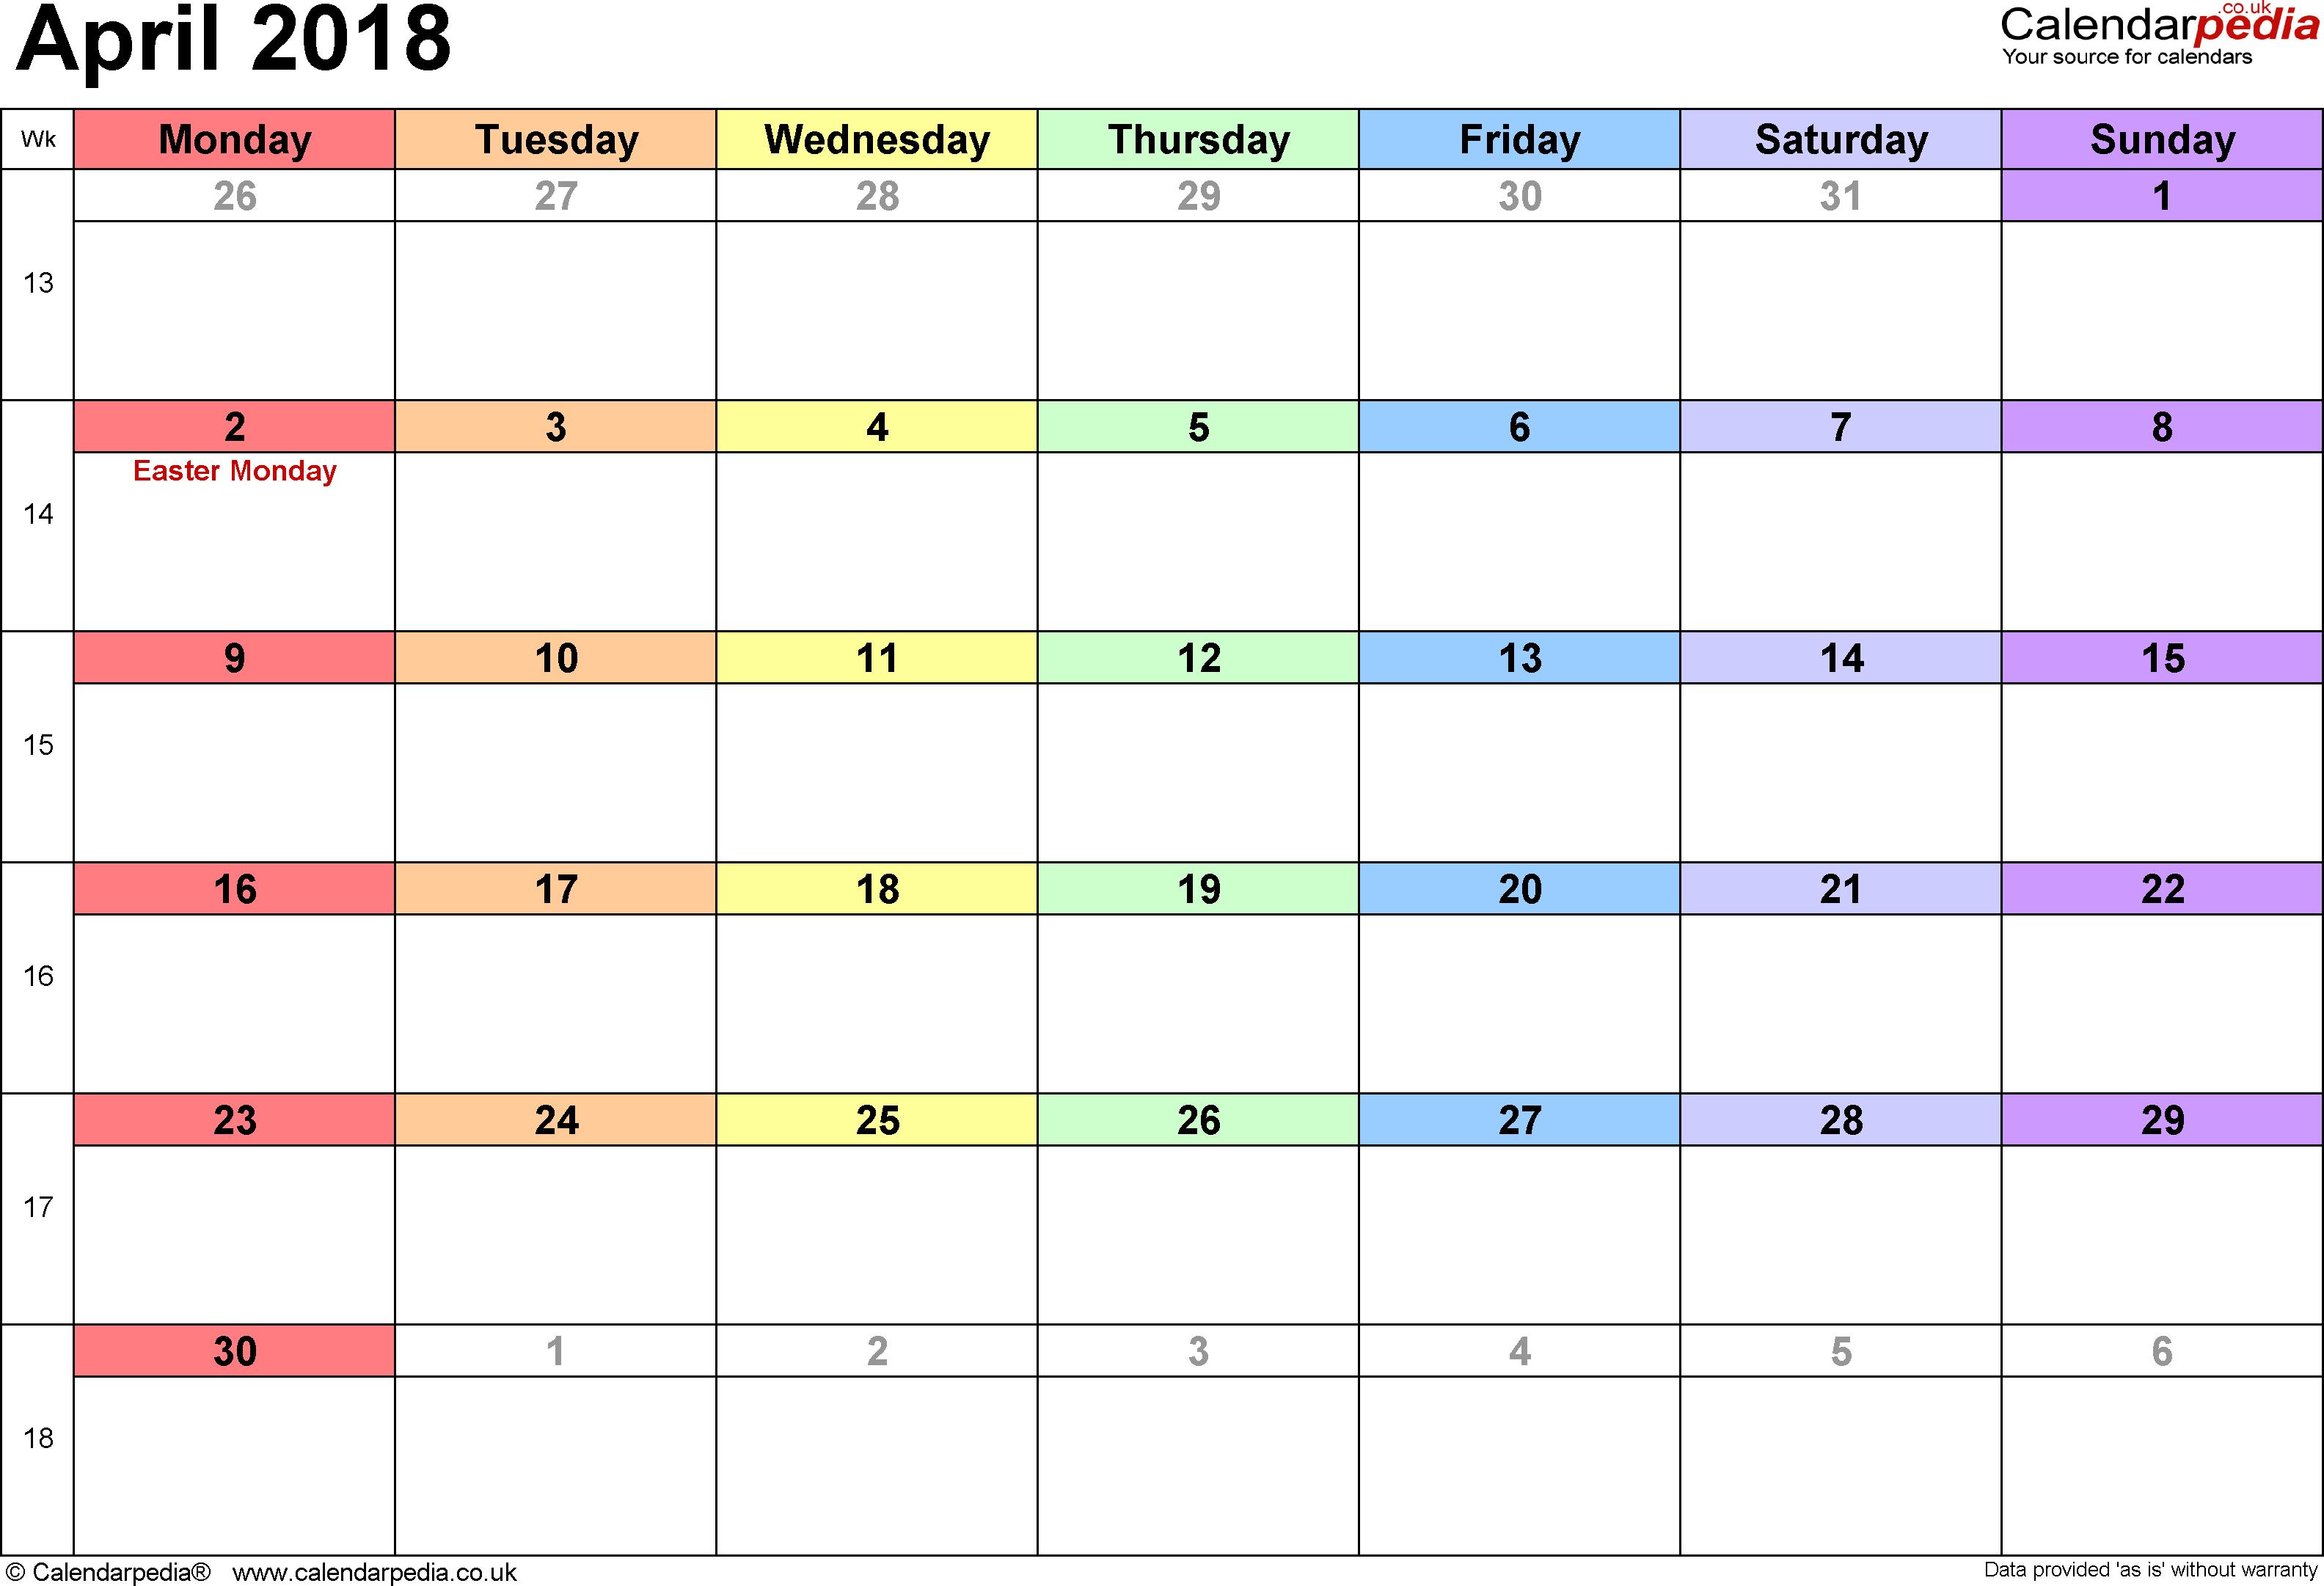 Calendar April 2018 Calendar April 2018 Calendar April 2018